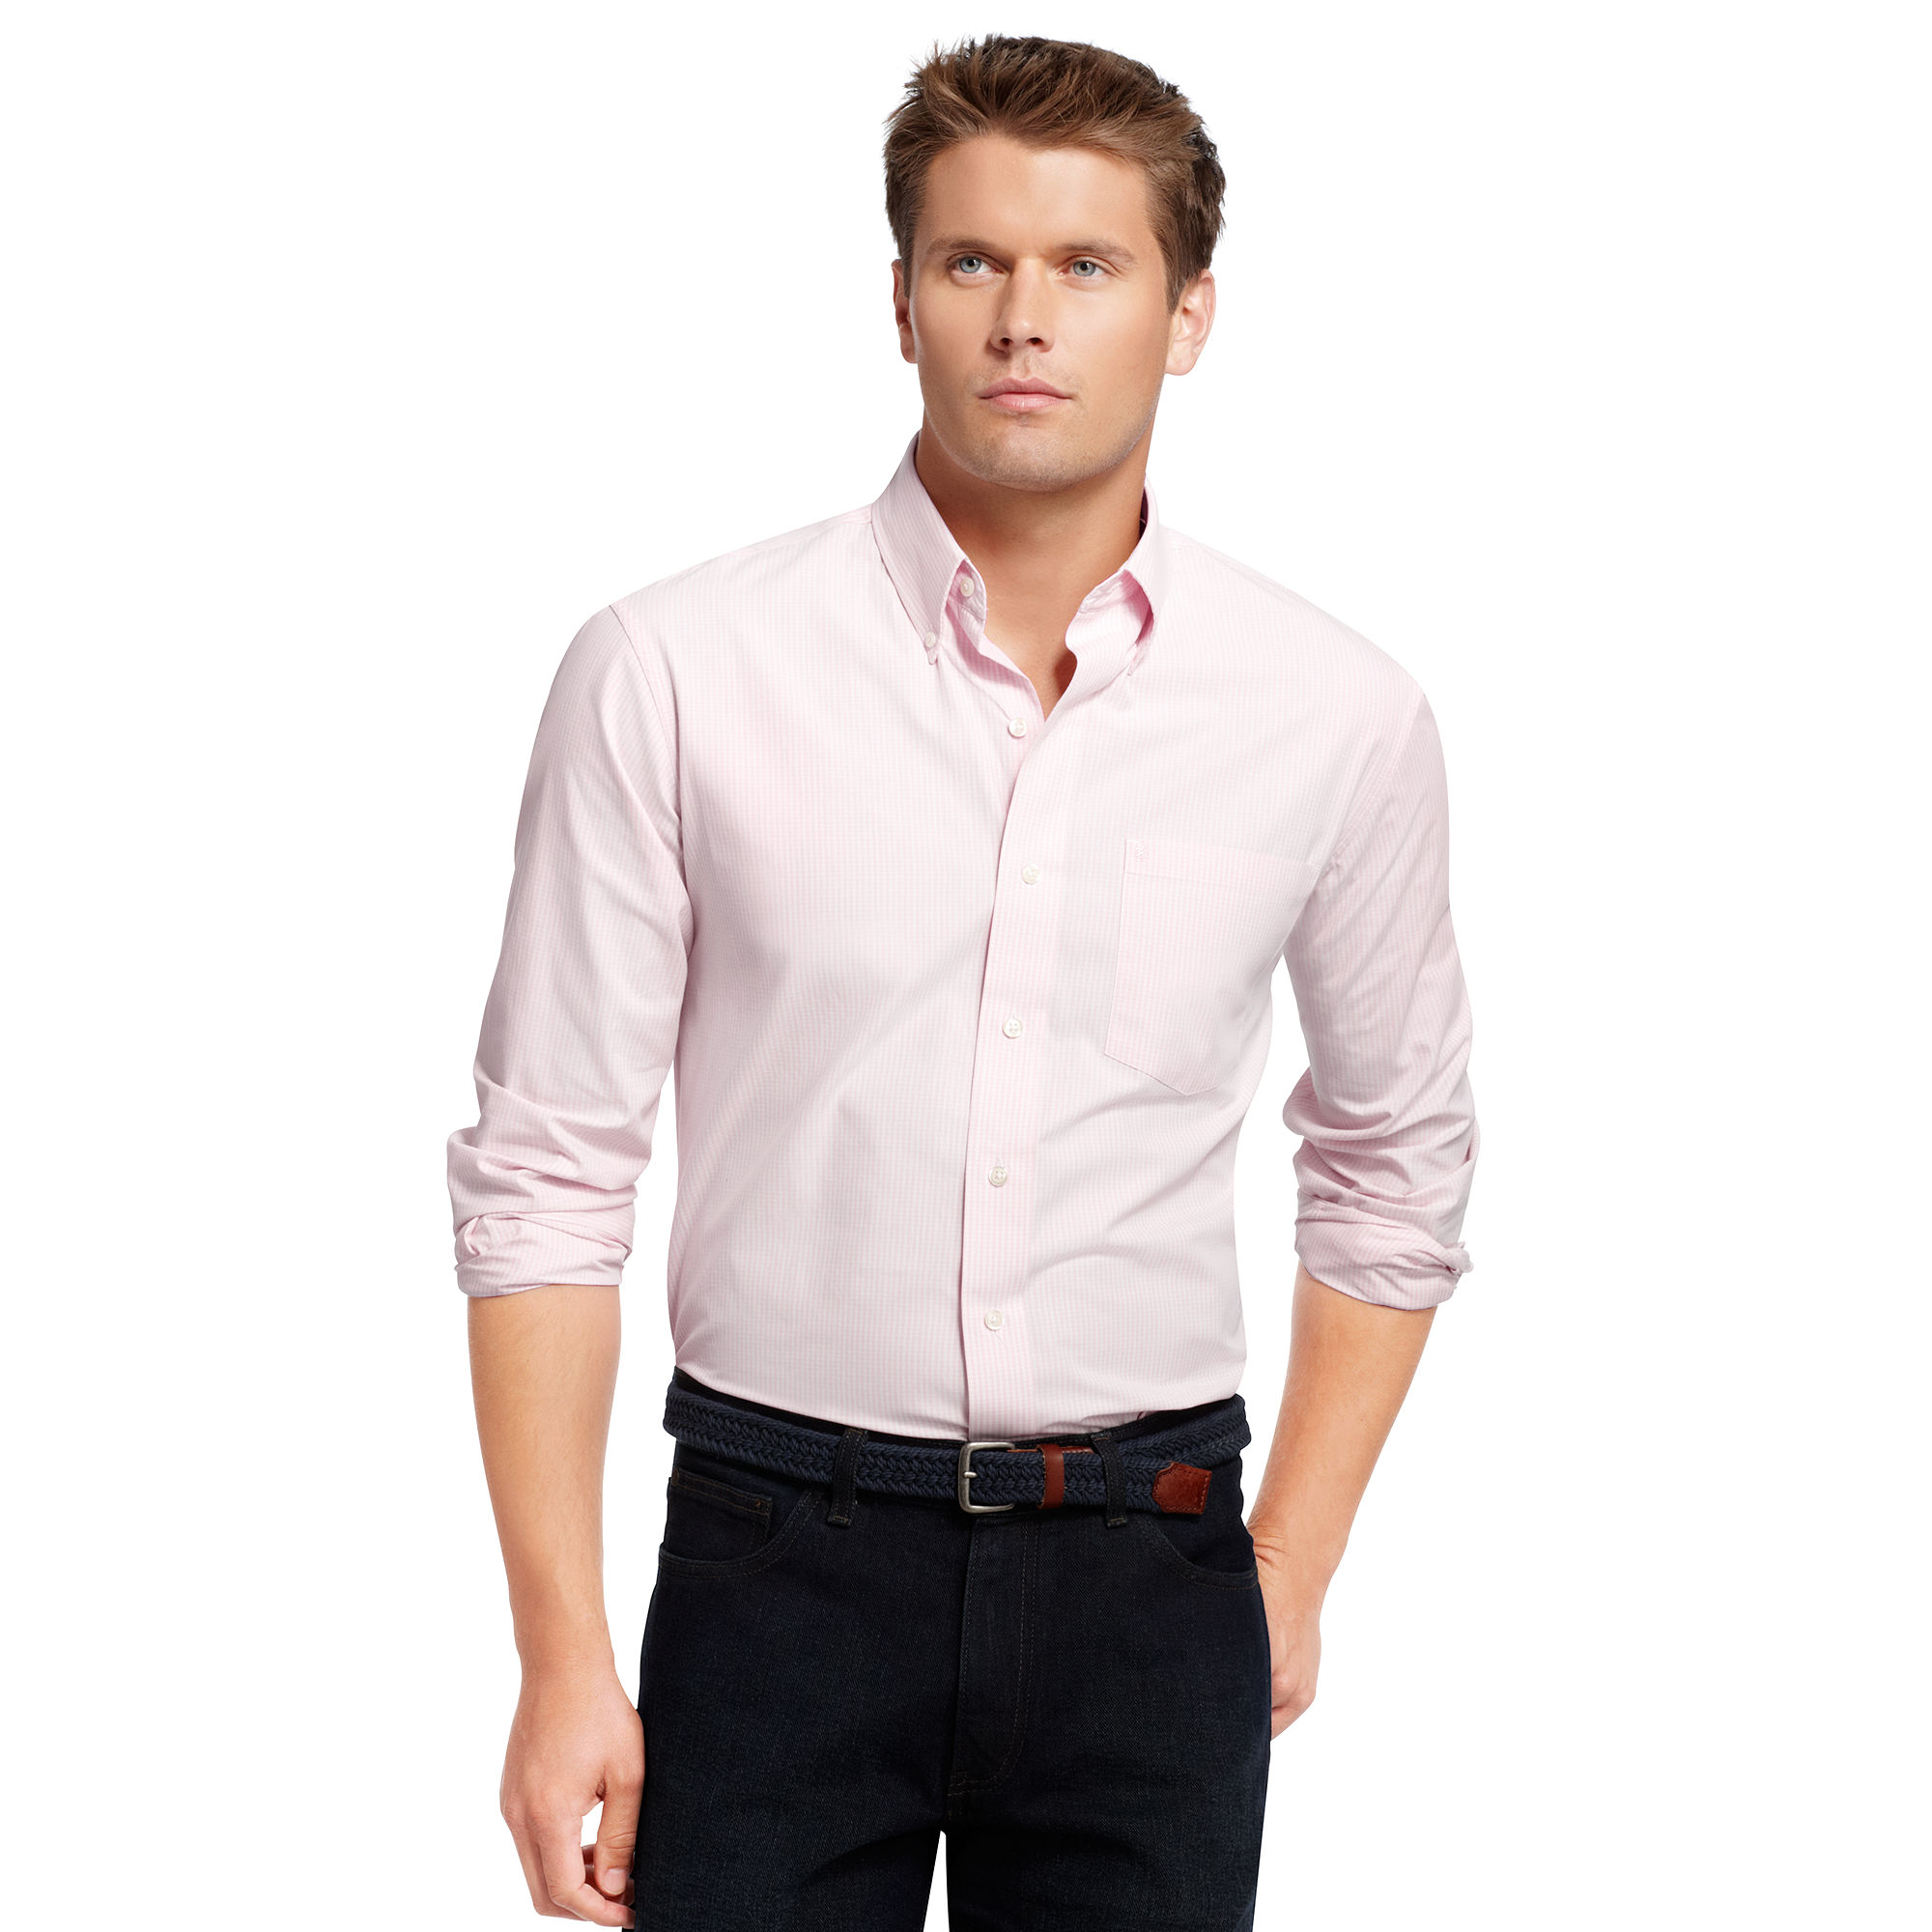 Izod big and tall shirt long sleeve essential mini for Izod big and tall shirts